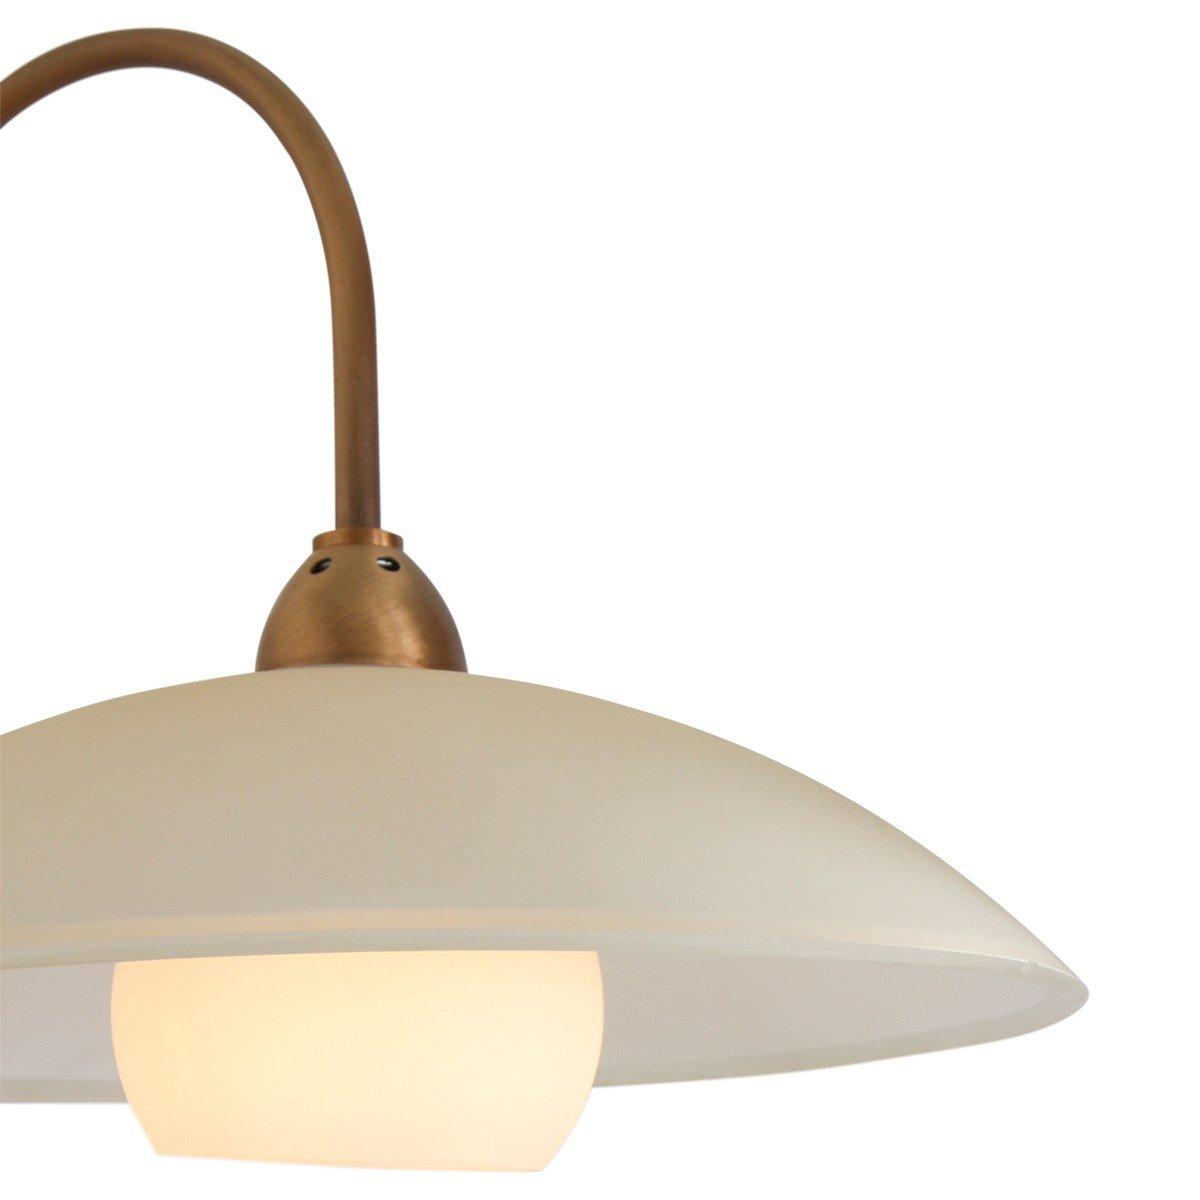 Sierlijke wandlamp